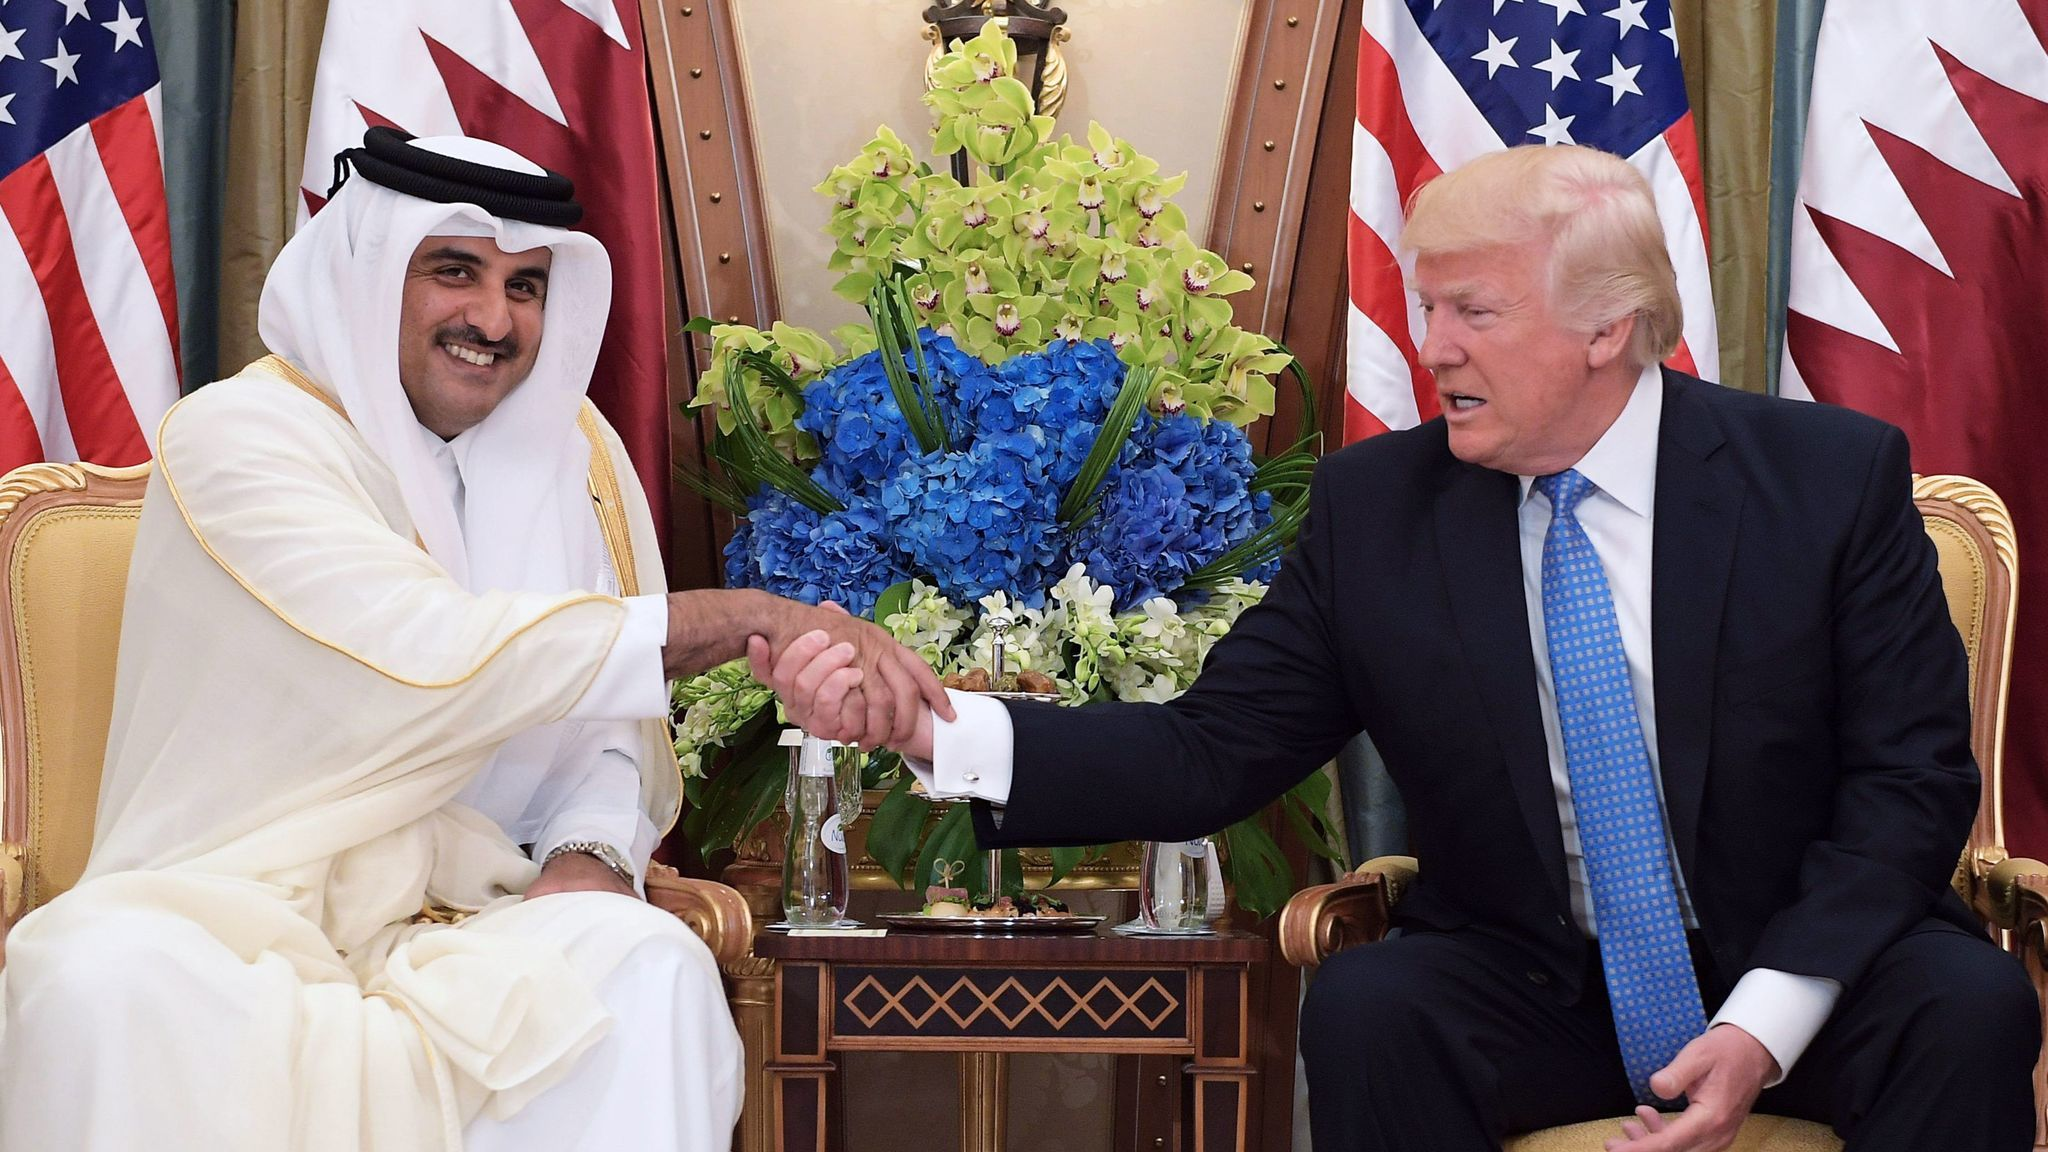 President Trump and Qatar's Emir Sheik Tamim bin Hamad al Thani during a bilateral meeting at a hotel in the Saudi capital, Riyadh, in May 2017.